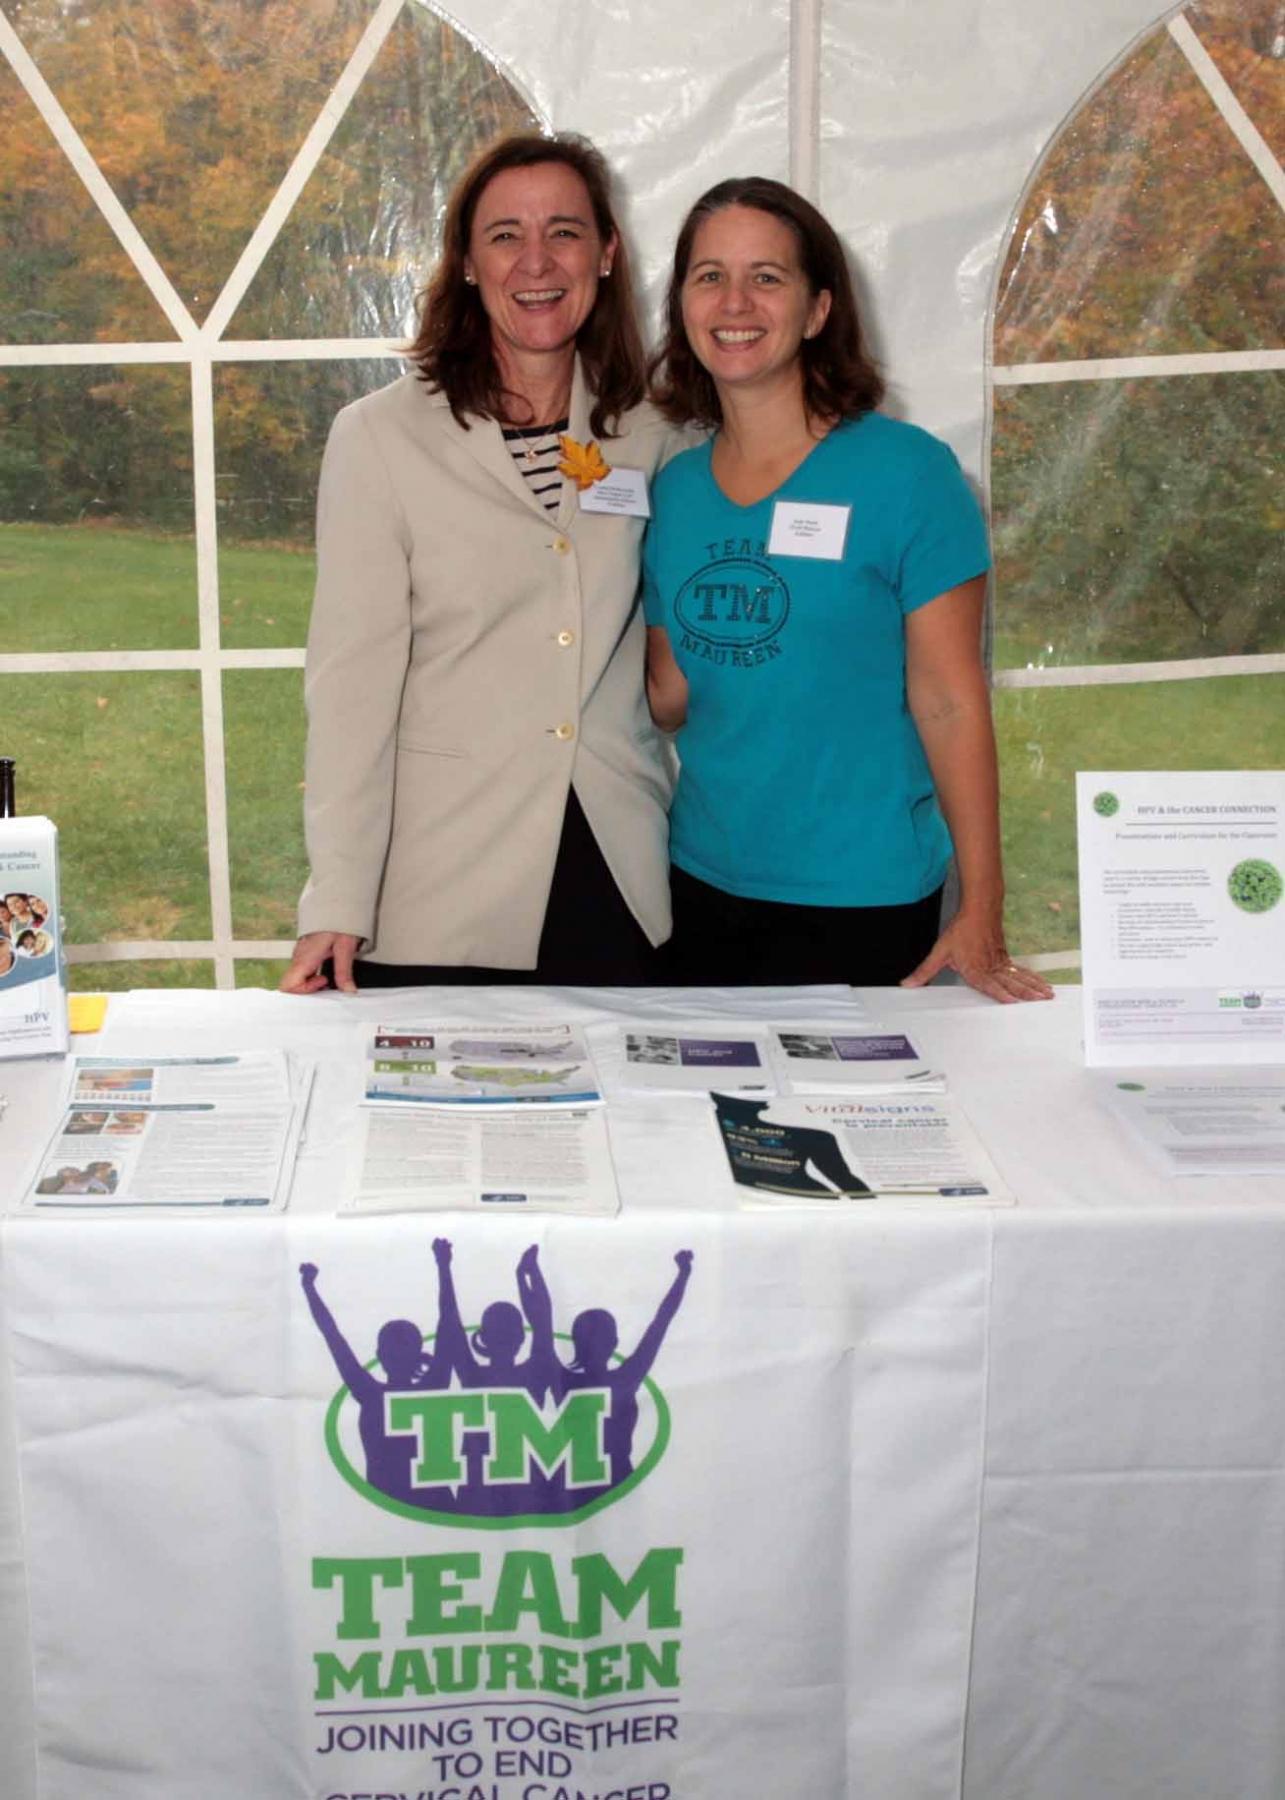 Team Maureen - MA PTA Health Summit Vendor